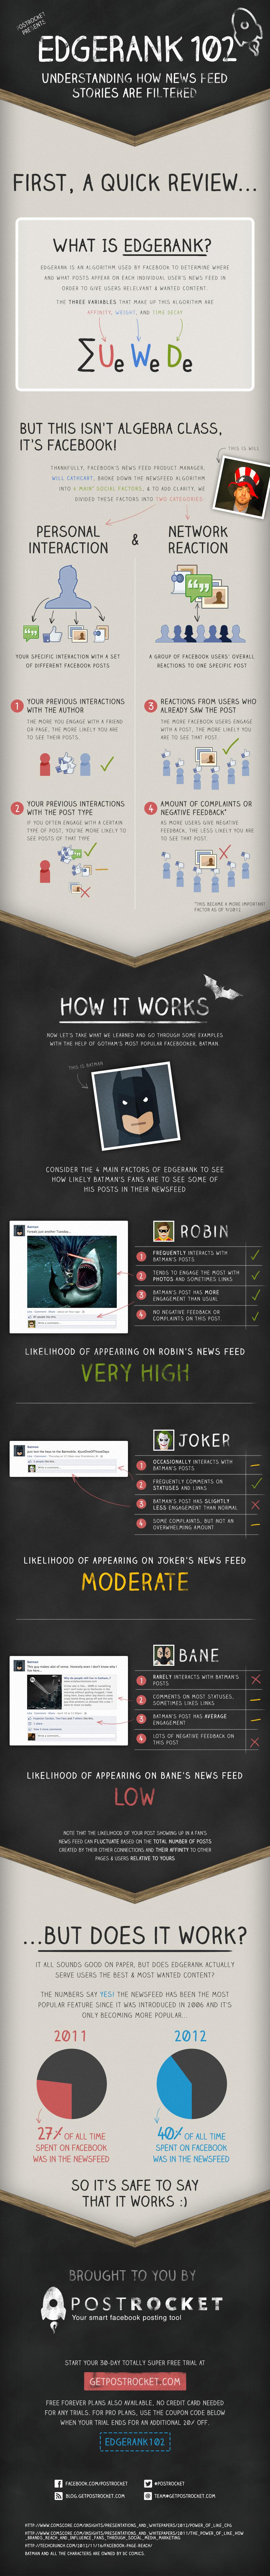 postrocket-facebook-edgerank-infographic